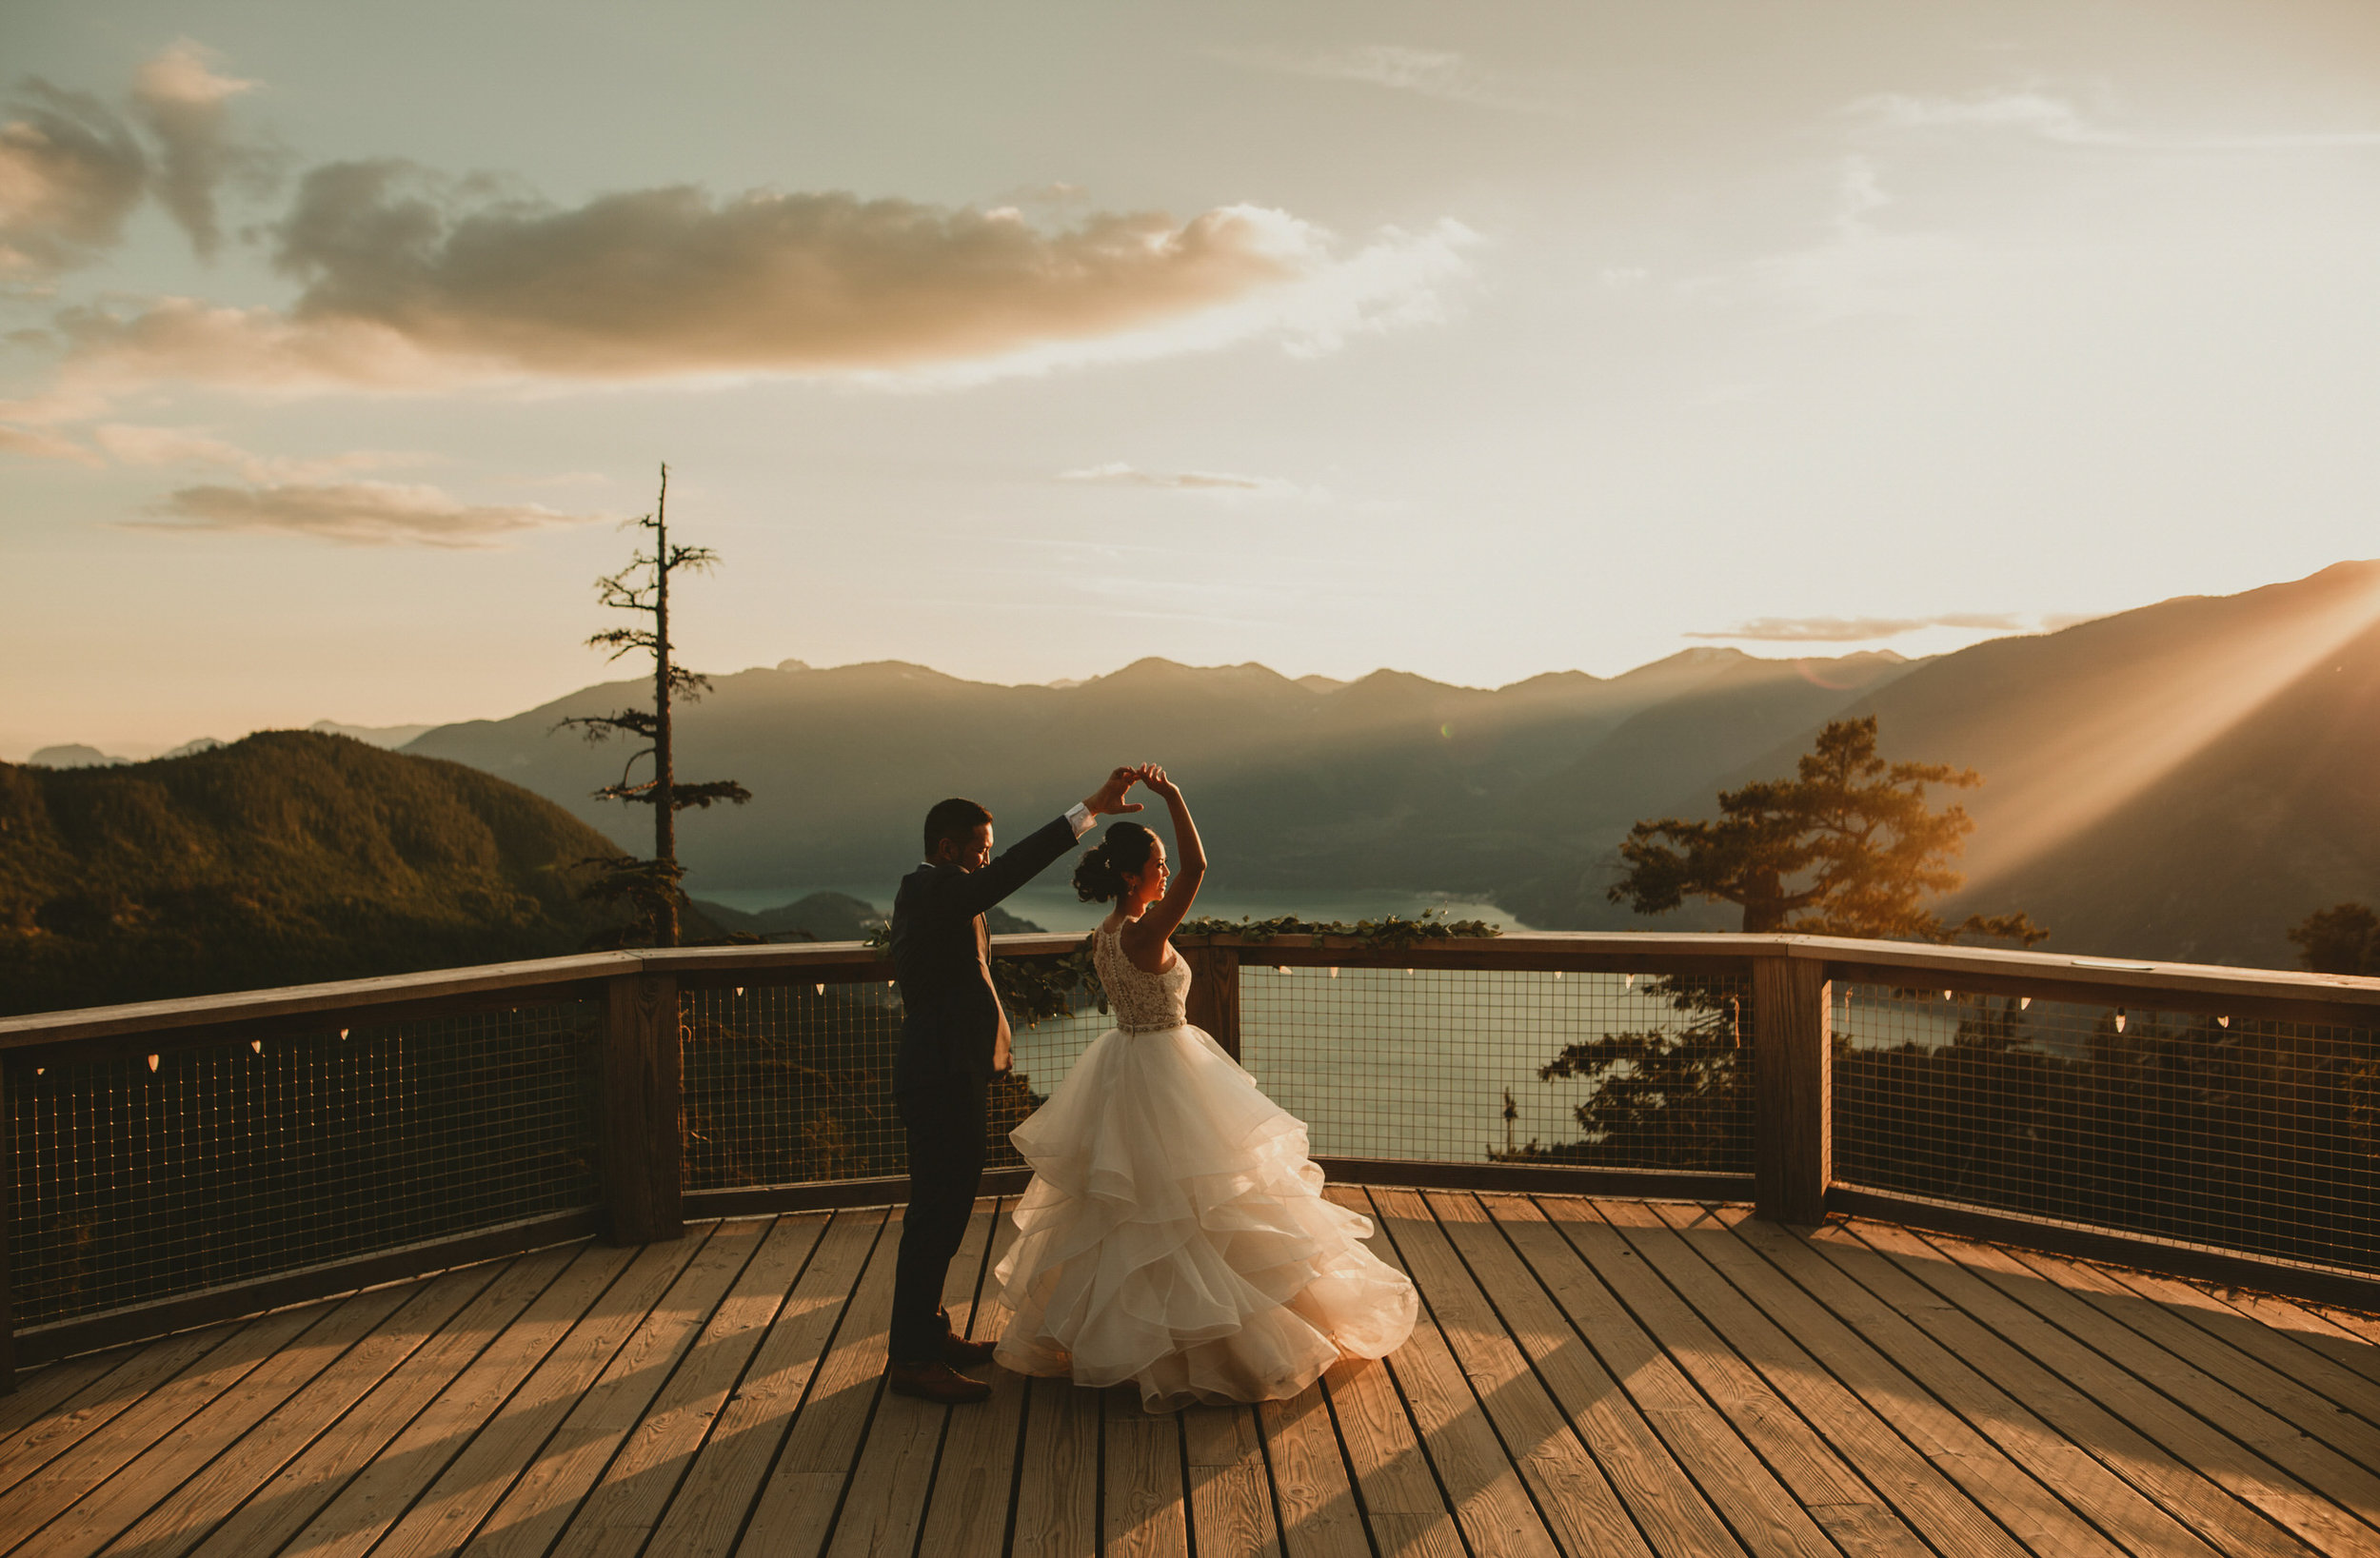 SEA TO SKY GONDOLA WEDDING - JENNIFER PICARD PHOTOGRAPHY - VANCOUVER WEDDING PHOTOGRAPHER - (2)_1 copy_1.jpg